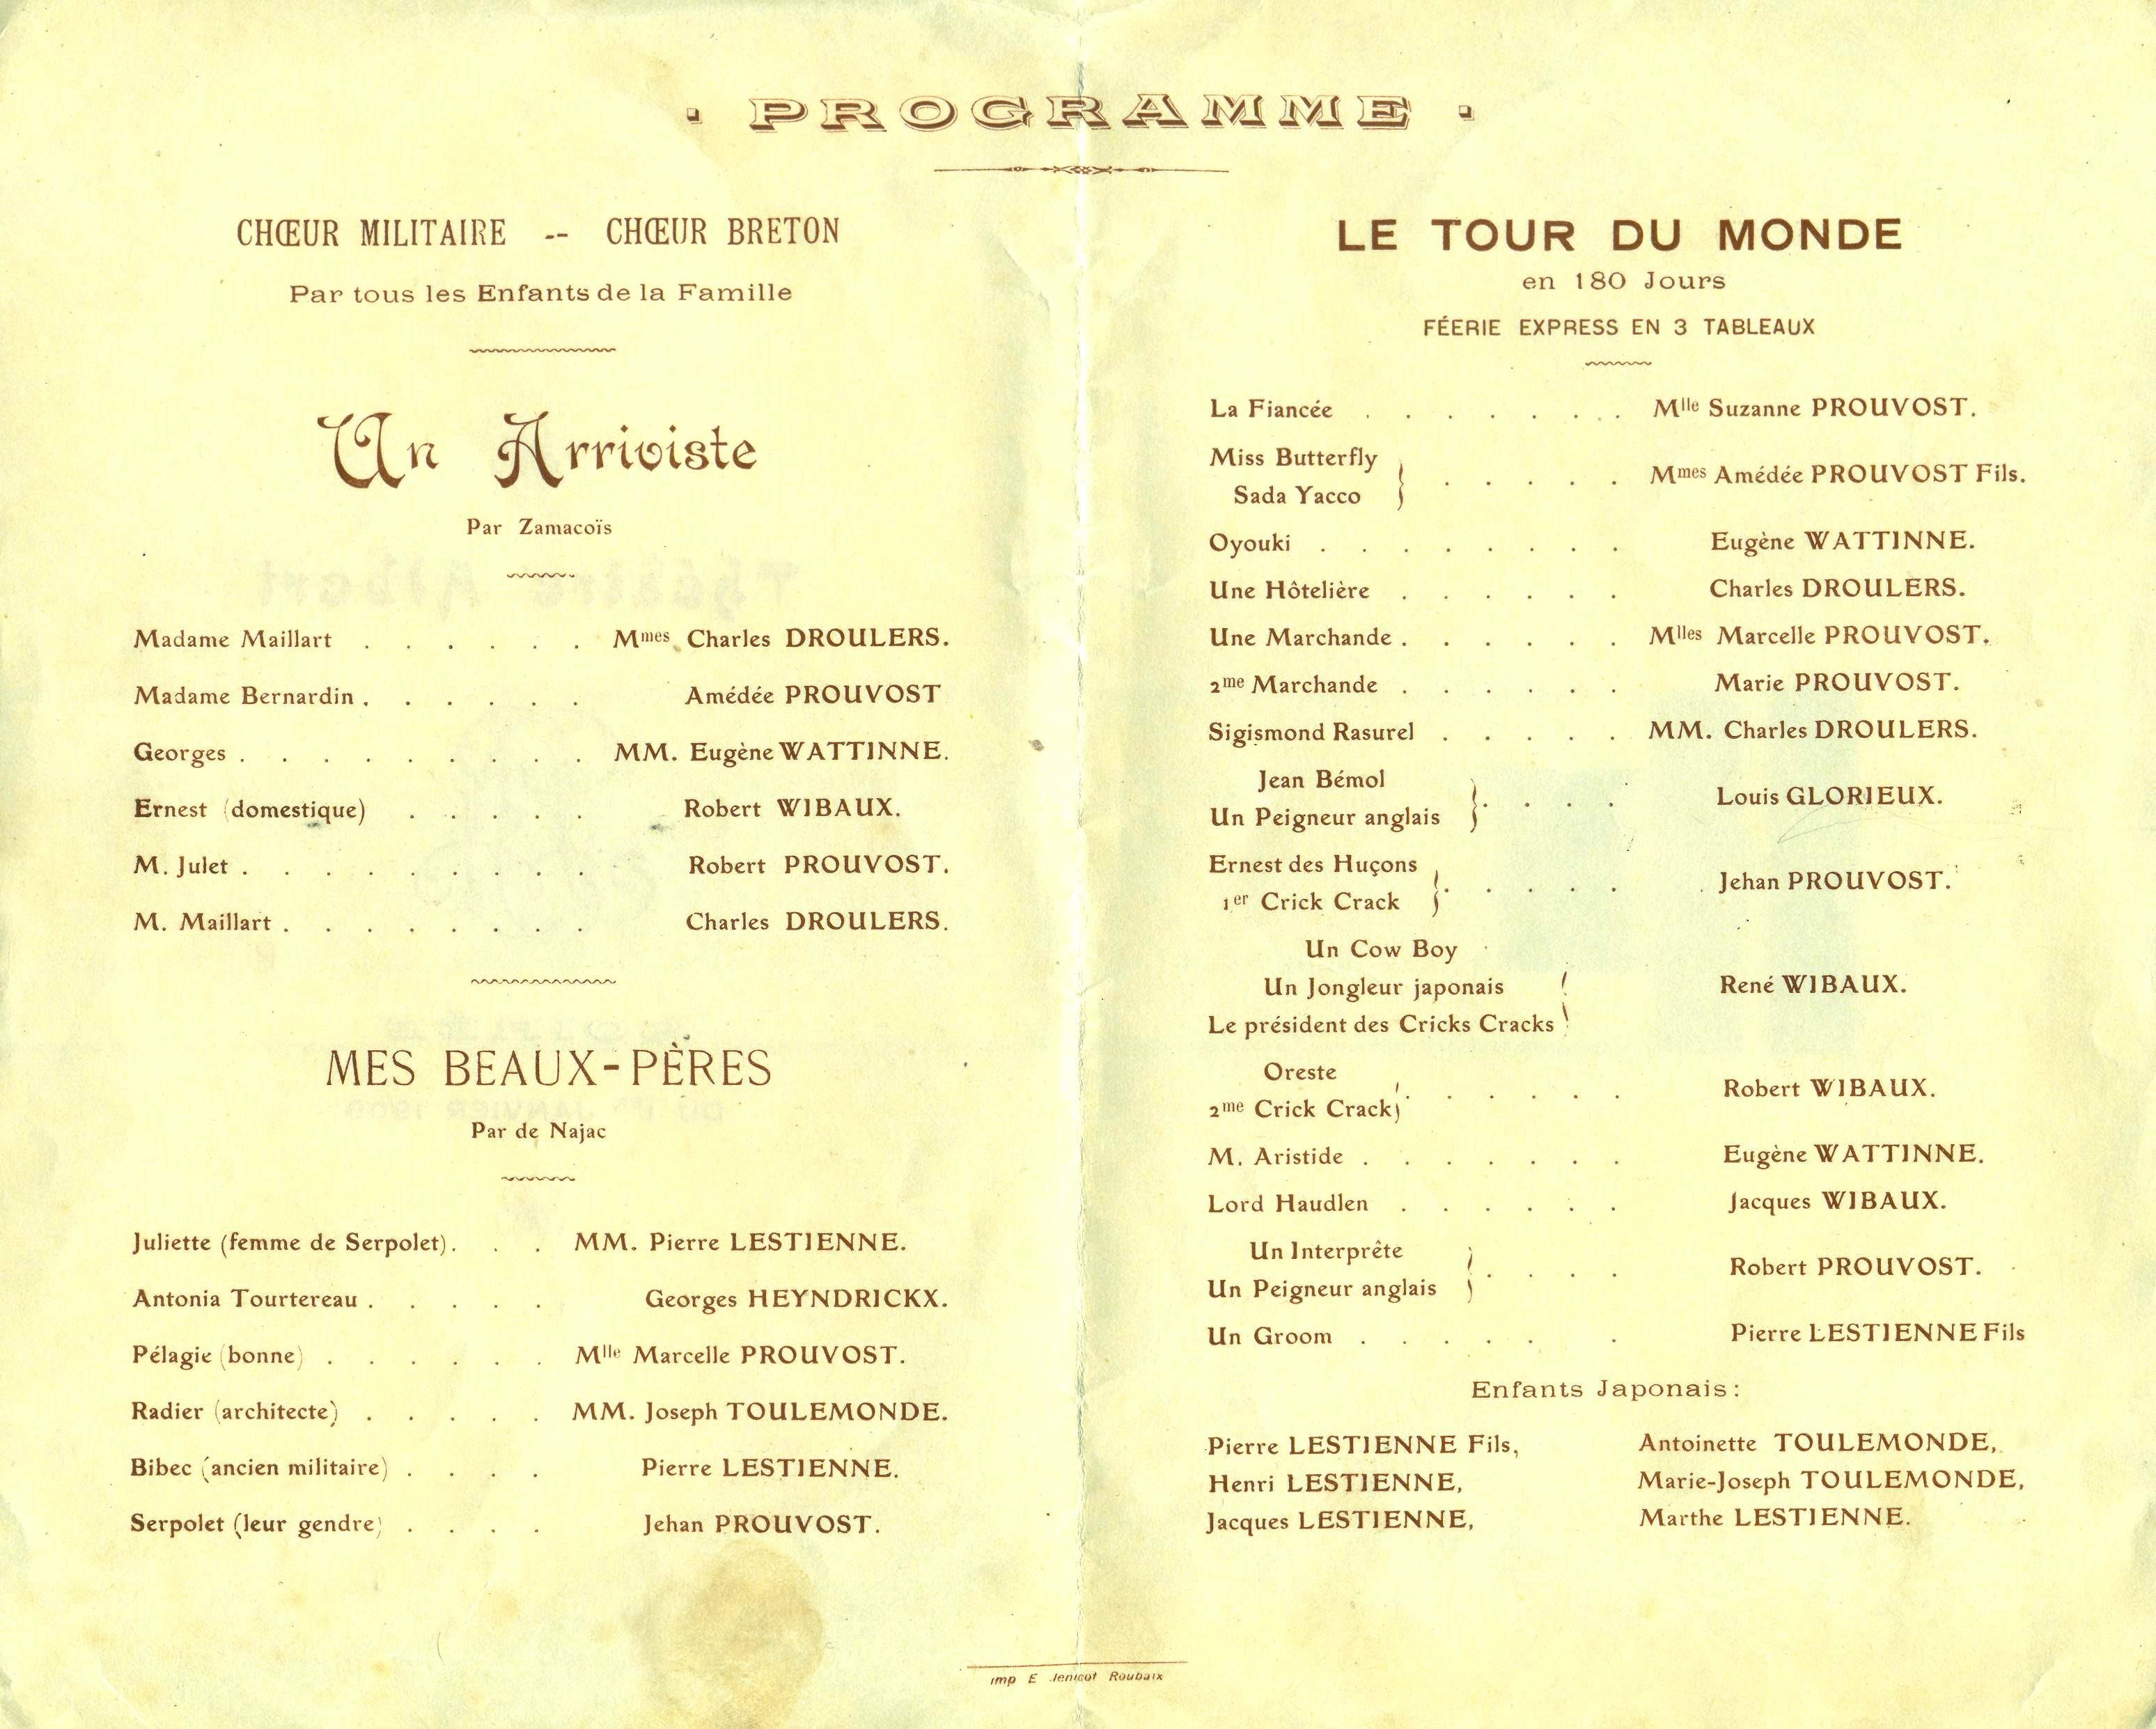 theatre-Albert-1er-janvie